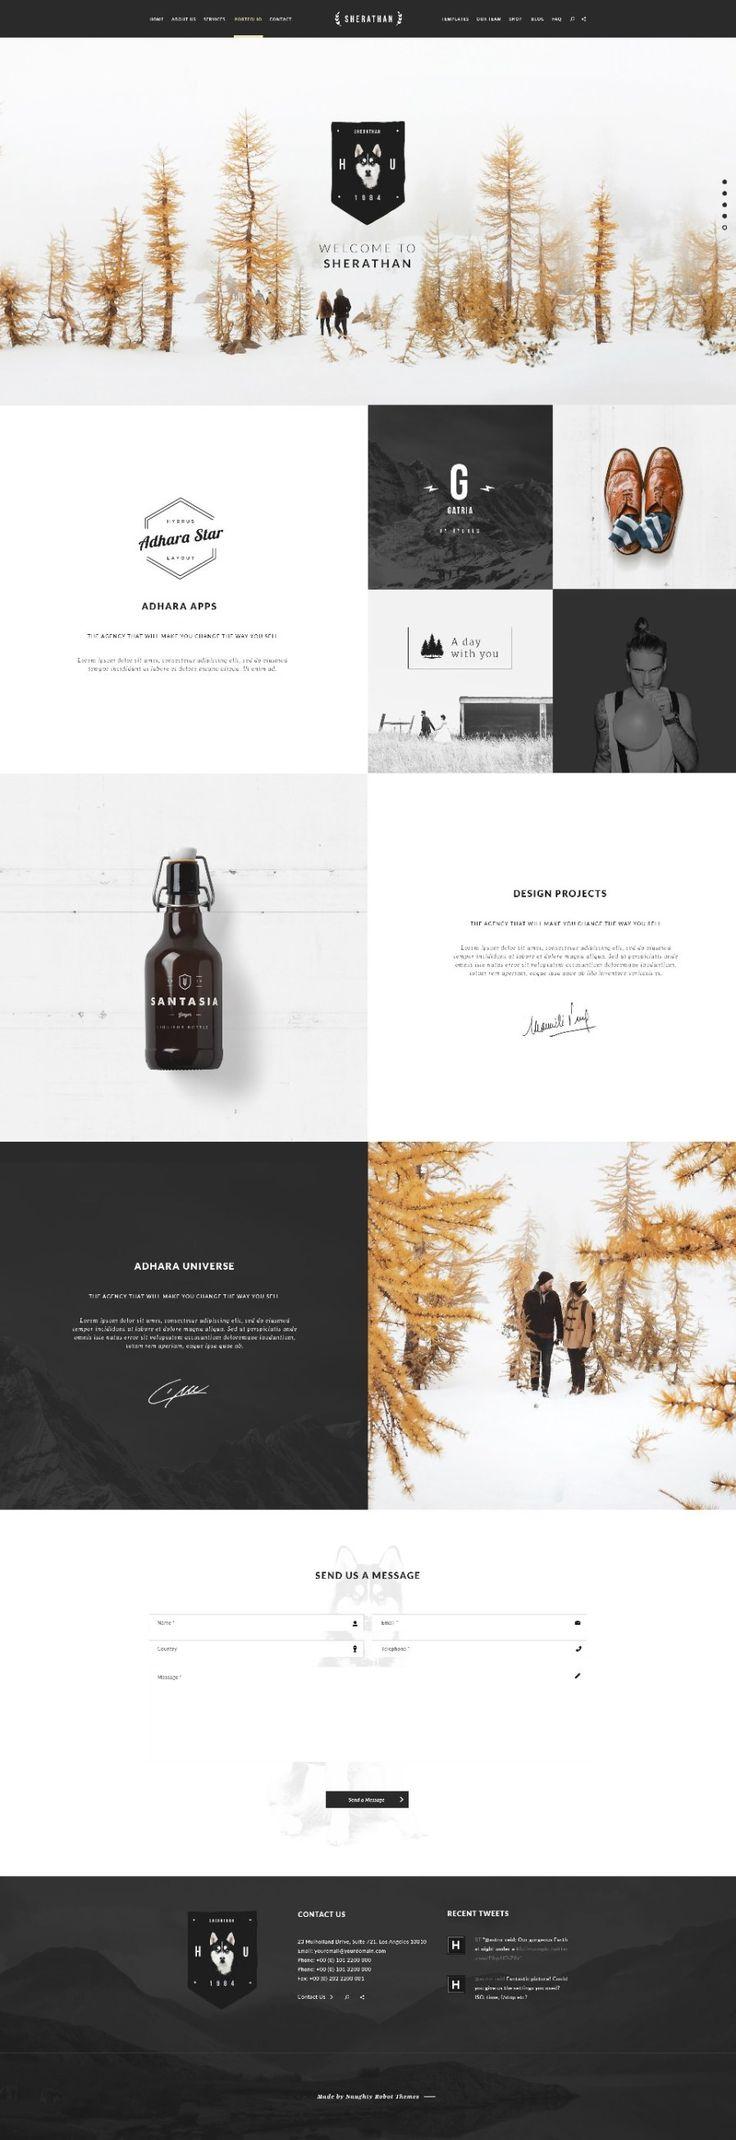 Hydrus Web Design Inspiration by naughtyrobot